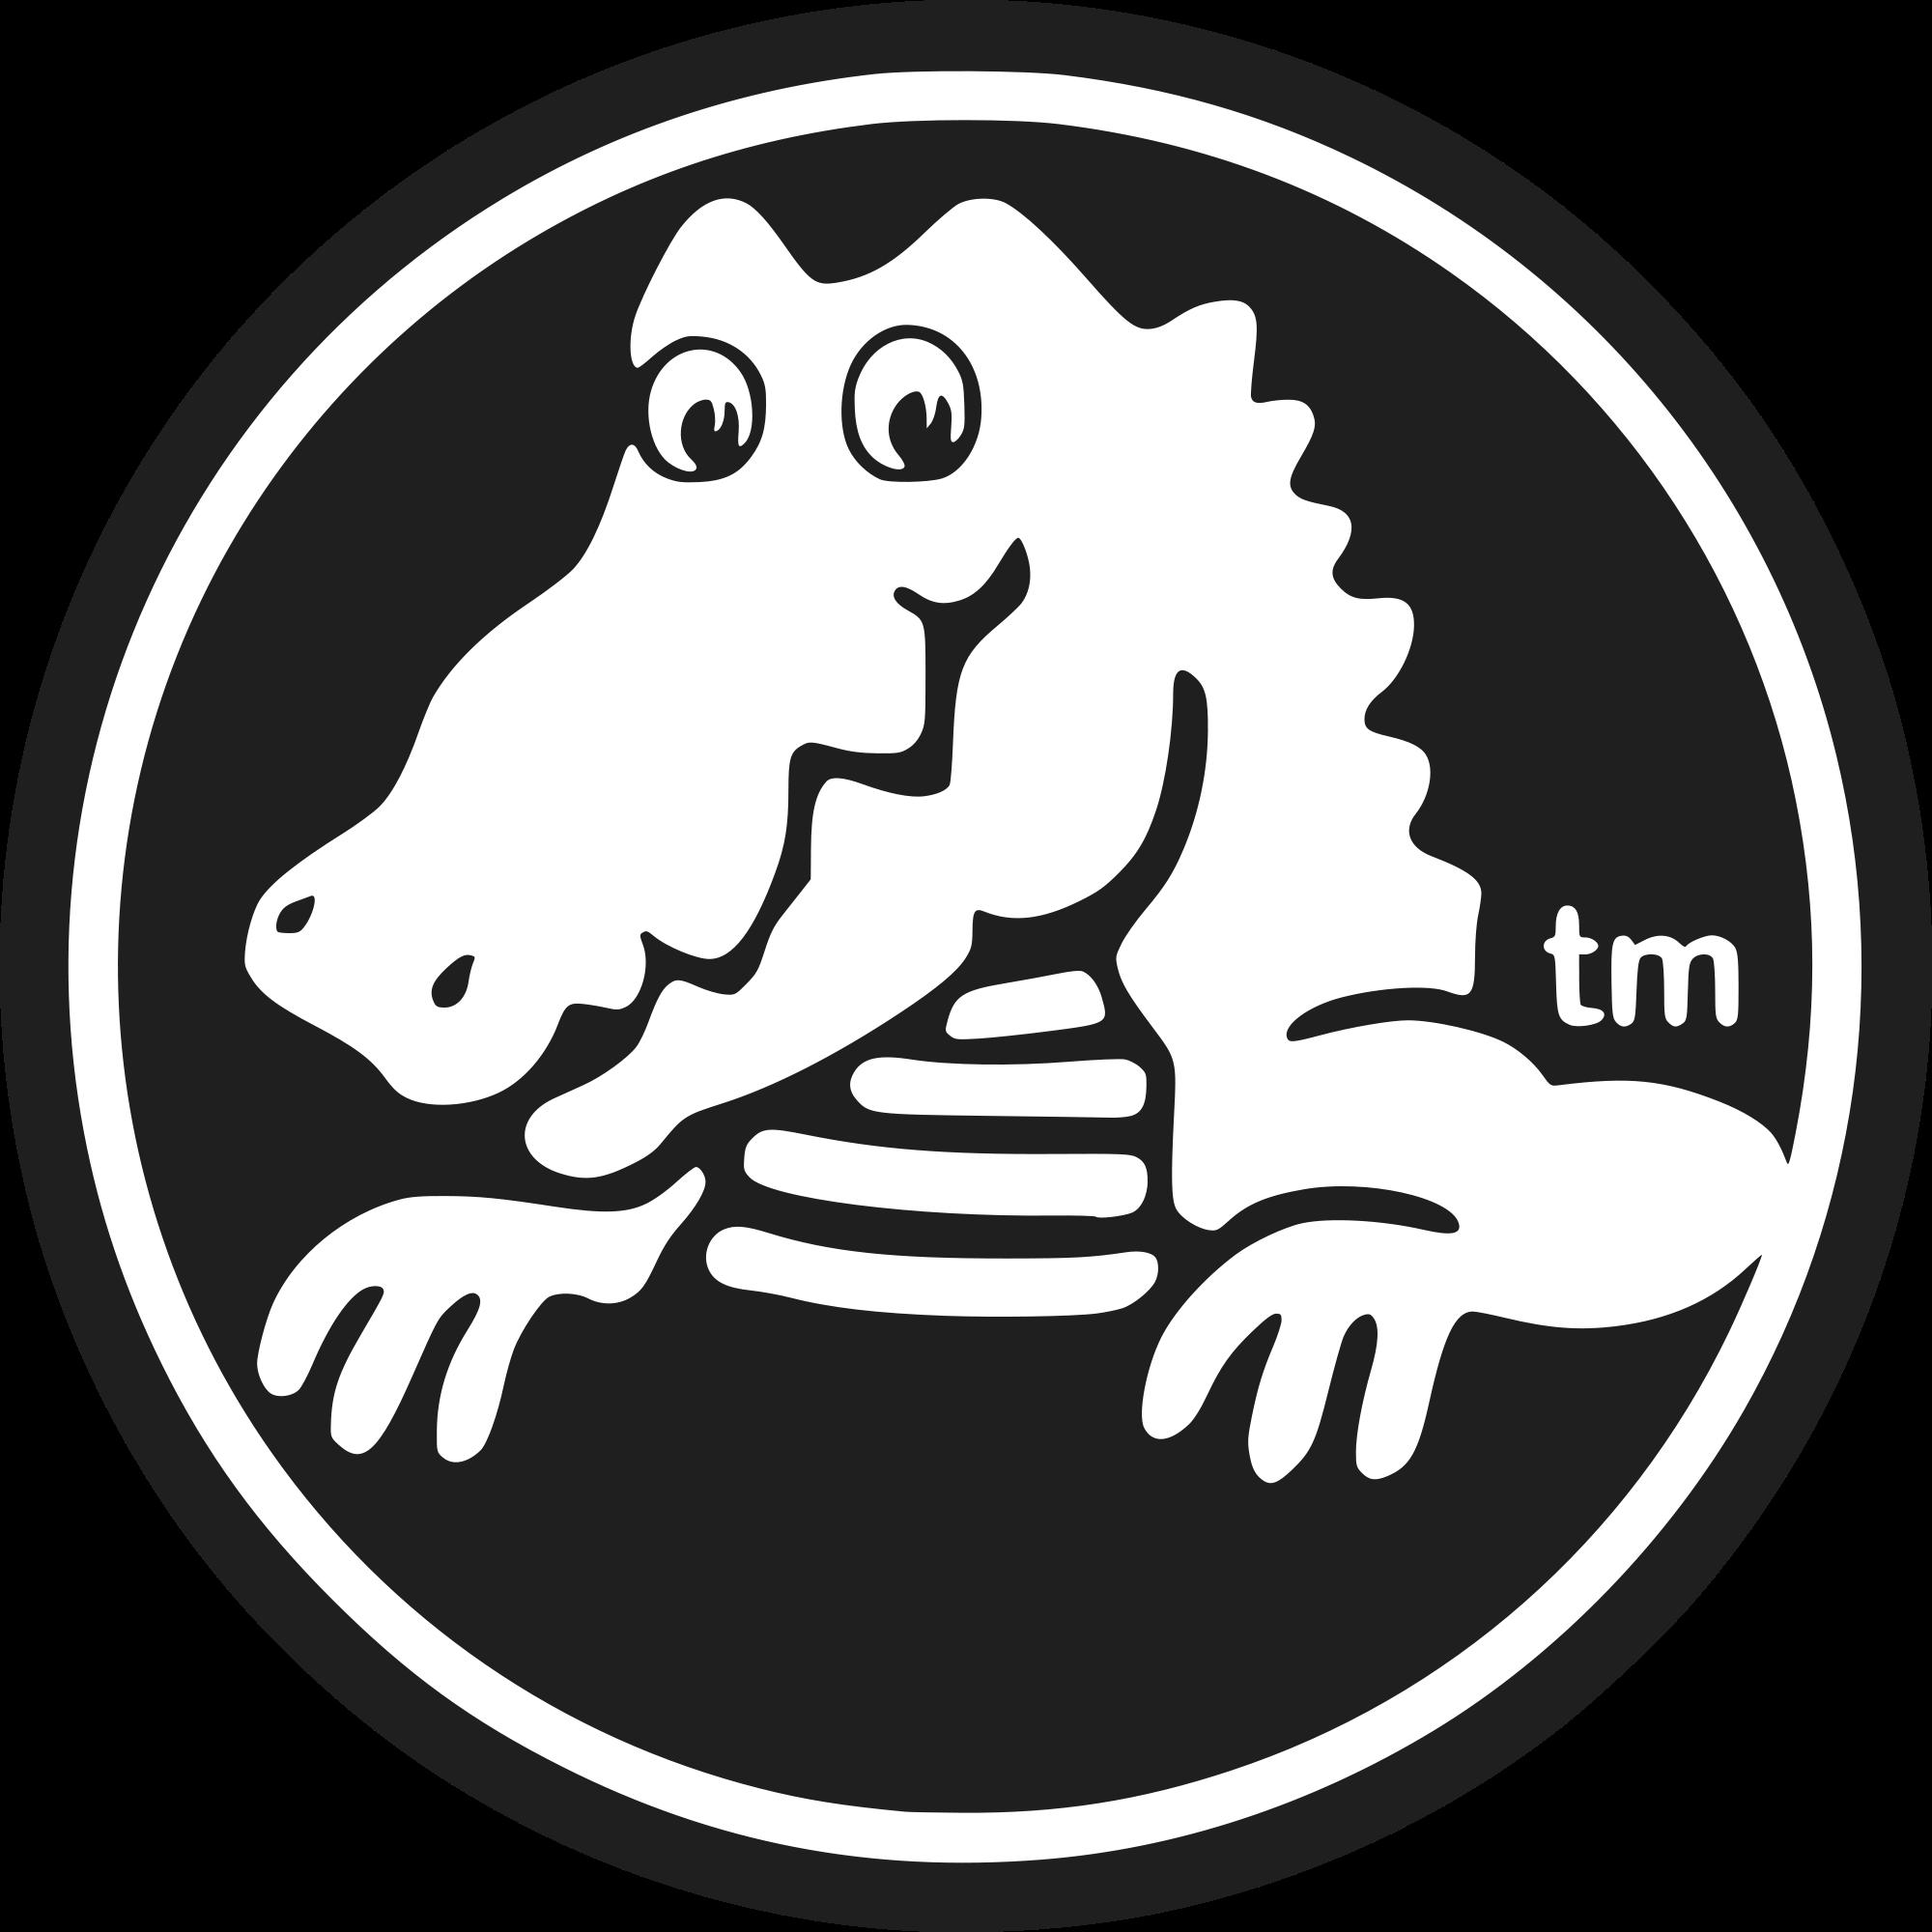 Crocs logo design pinterest. Yearbook clipart pictorial directory